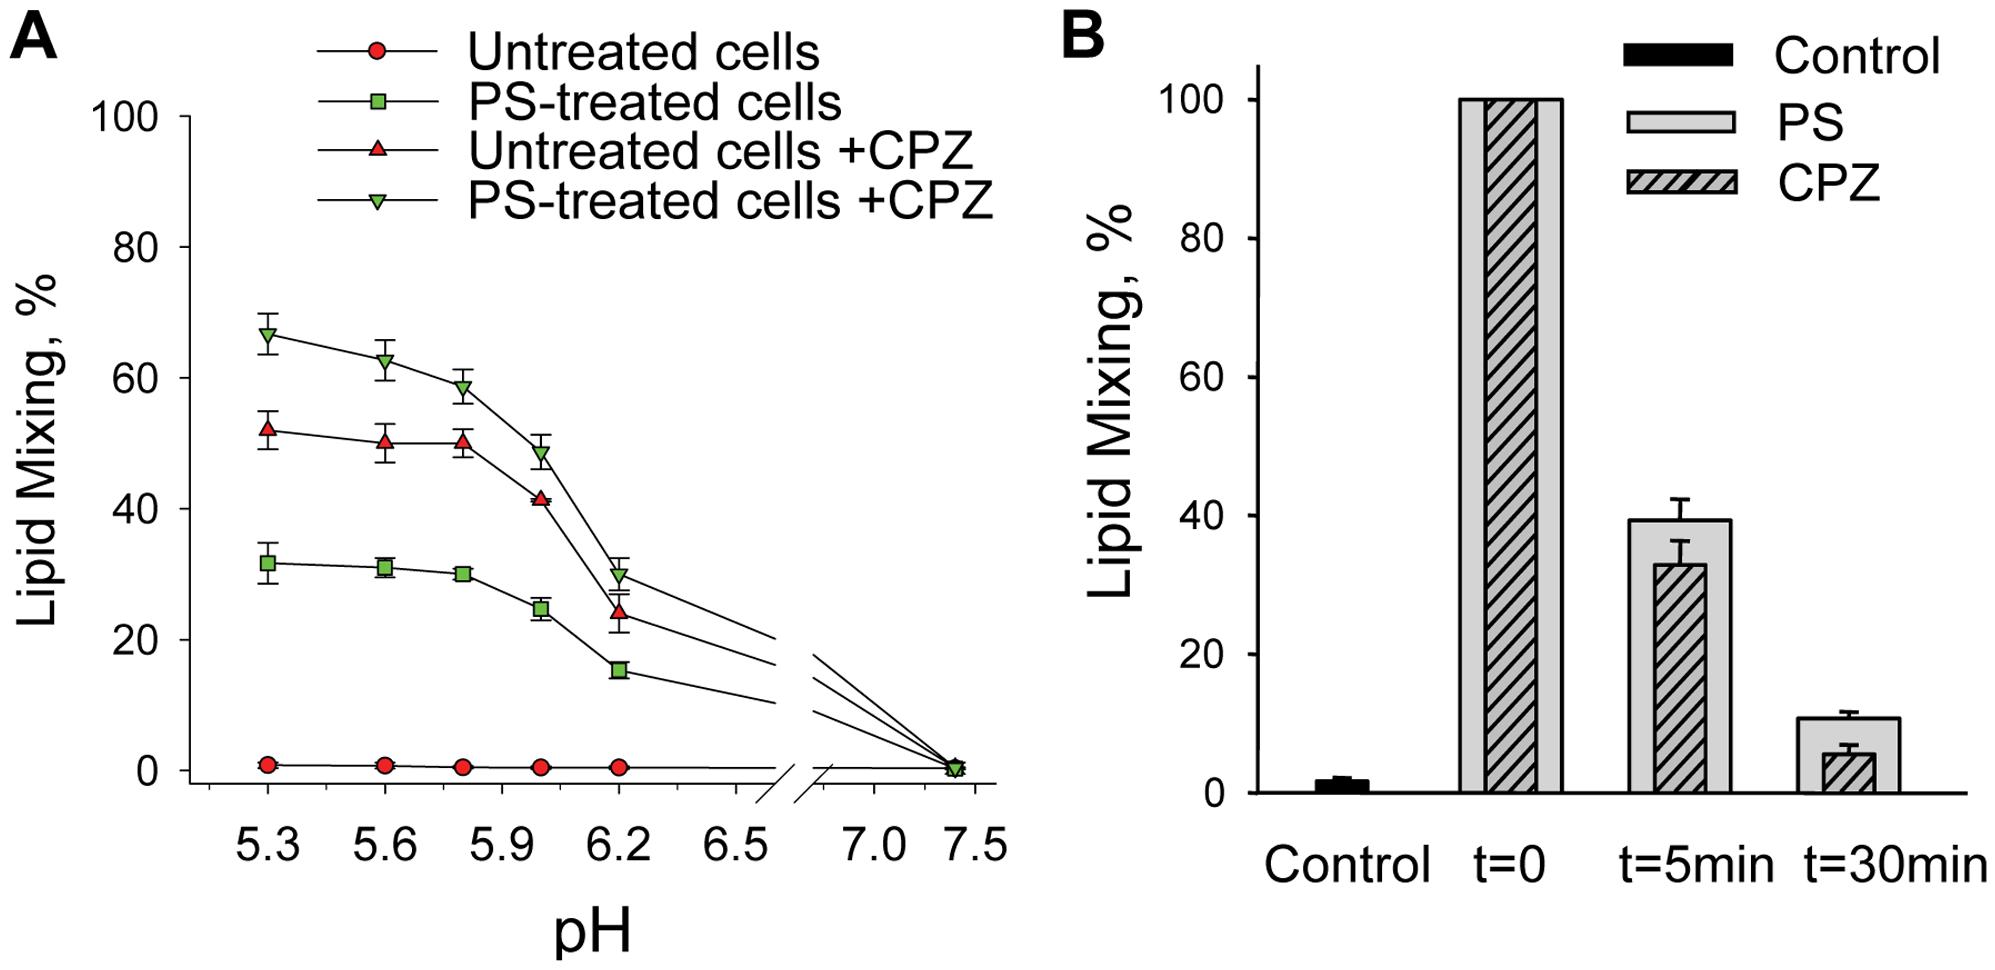 The lack of anionic lipids blocks fusion advance beyond restricted hemifusion intermediates.